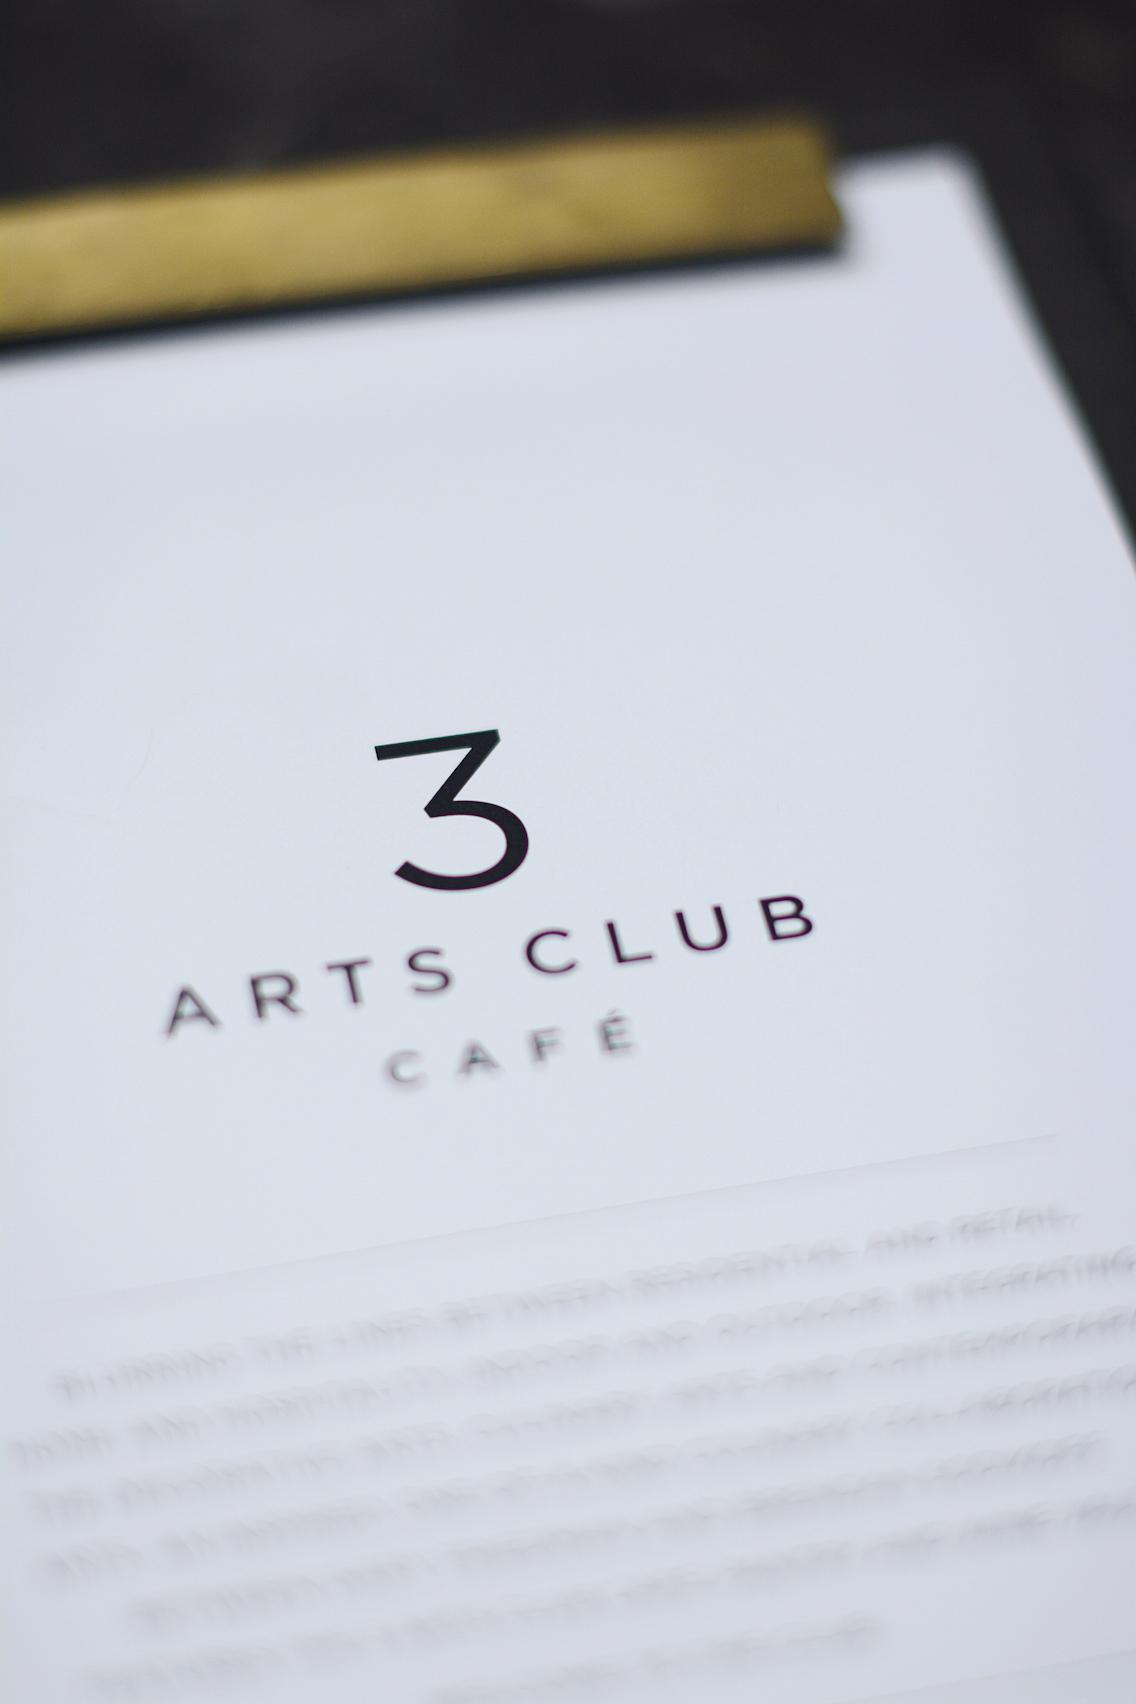 Three Arts Club Chicago 20